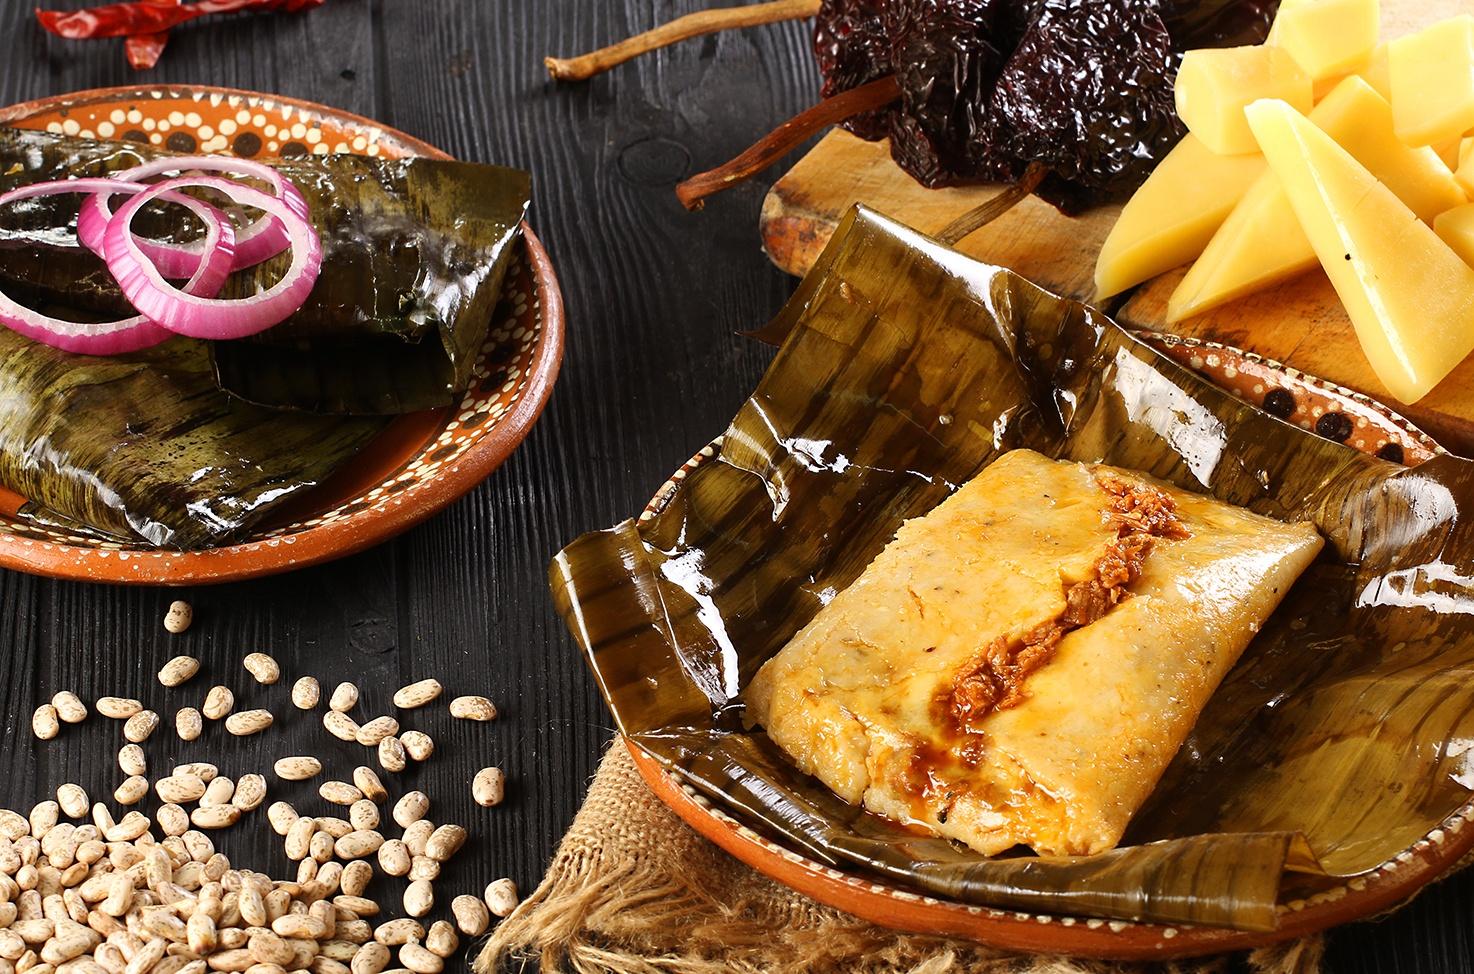 https://0201.nccdn.net/1_2/000/000/0bc/e2b/IMG_5283-frijol-con-queso-y-salsa-de-chicharron-1474x974.jpg